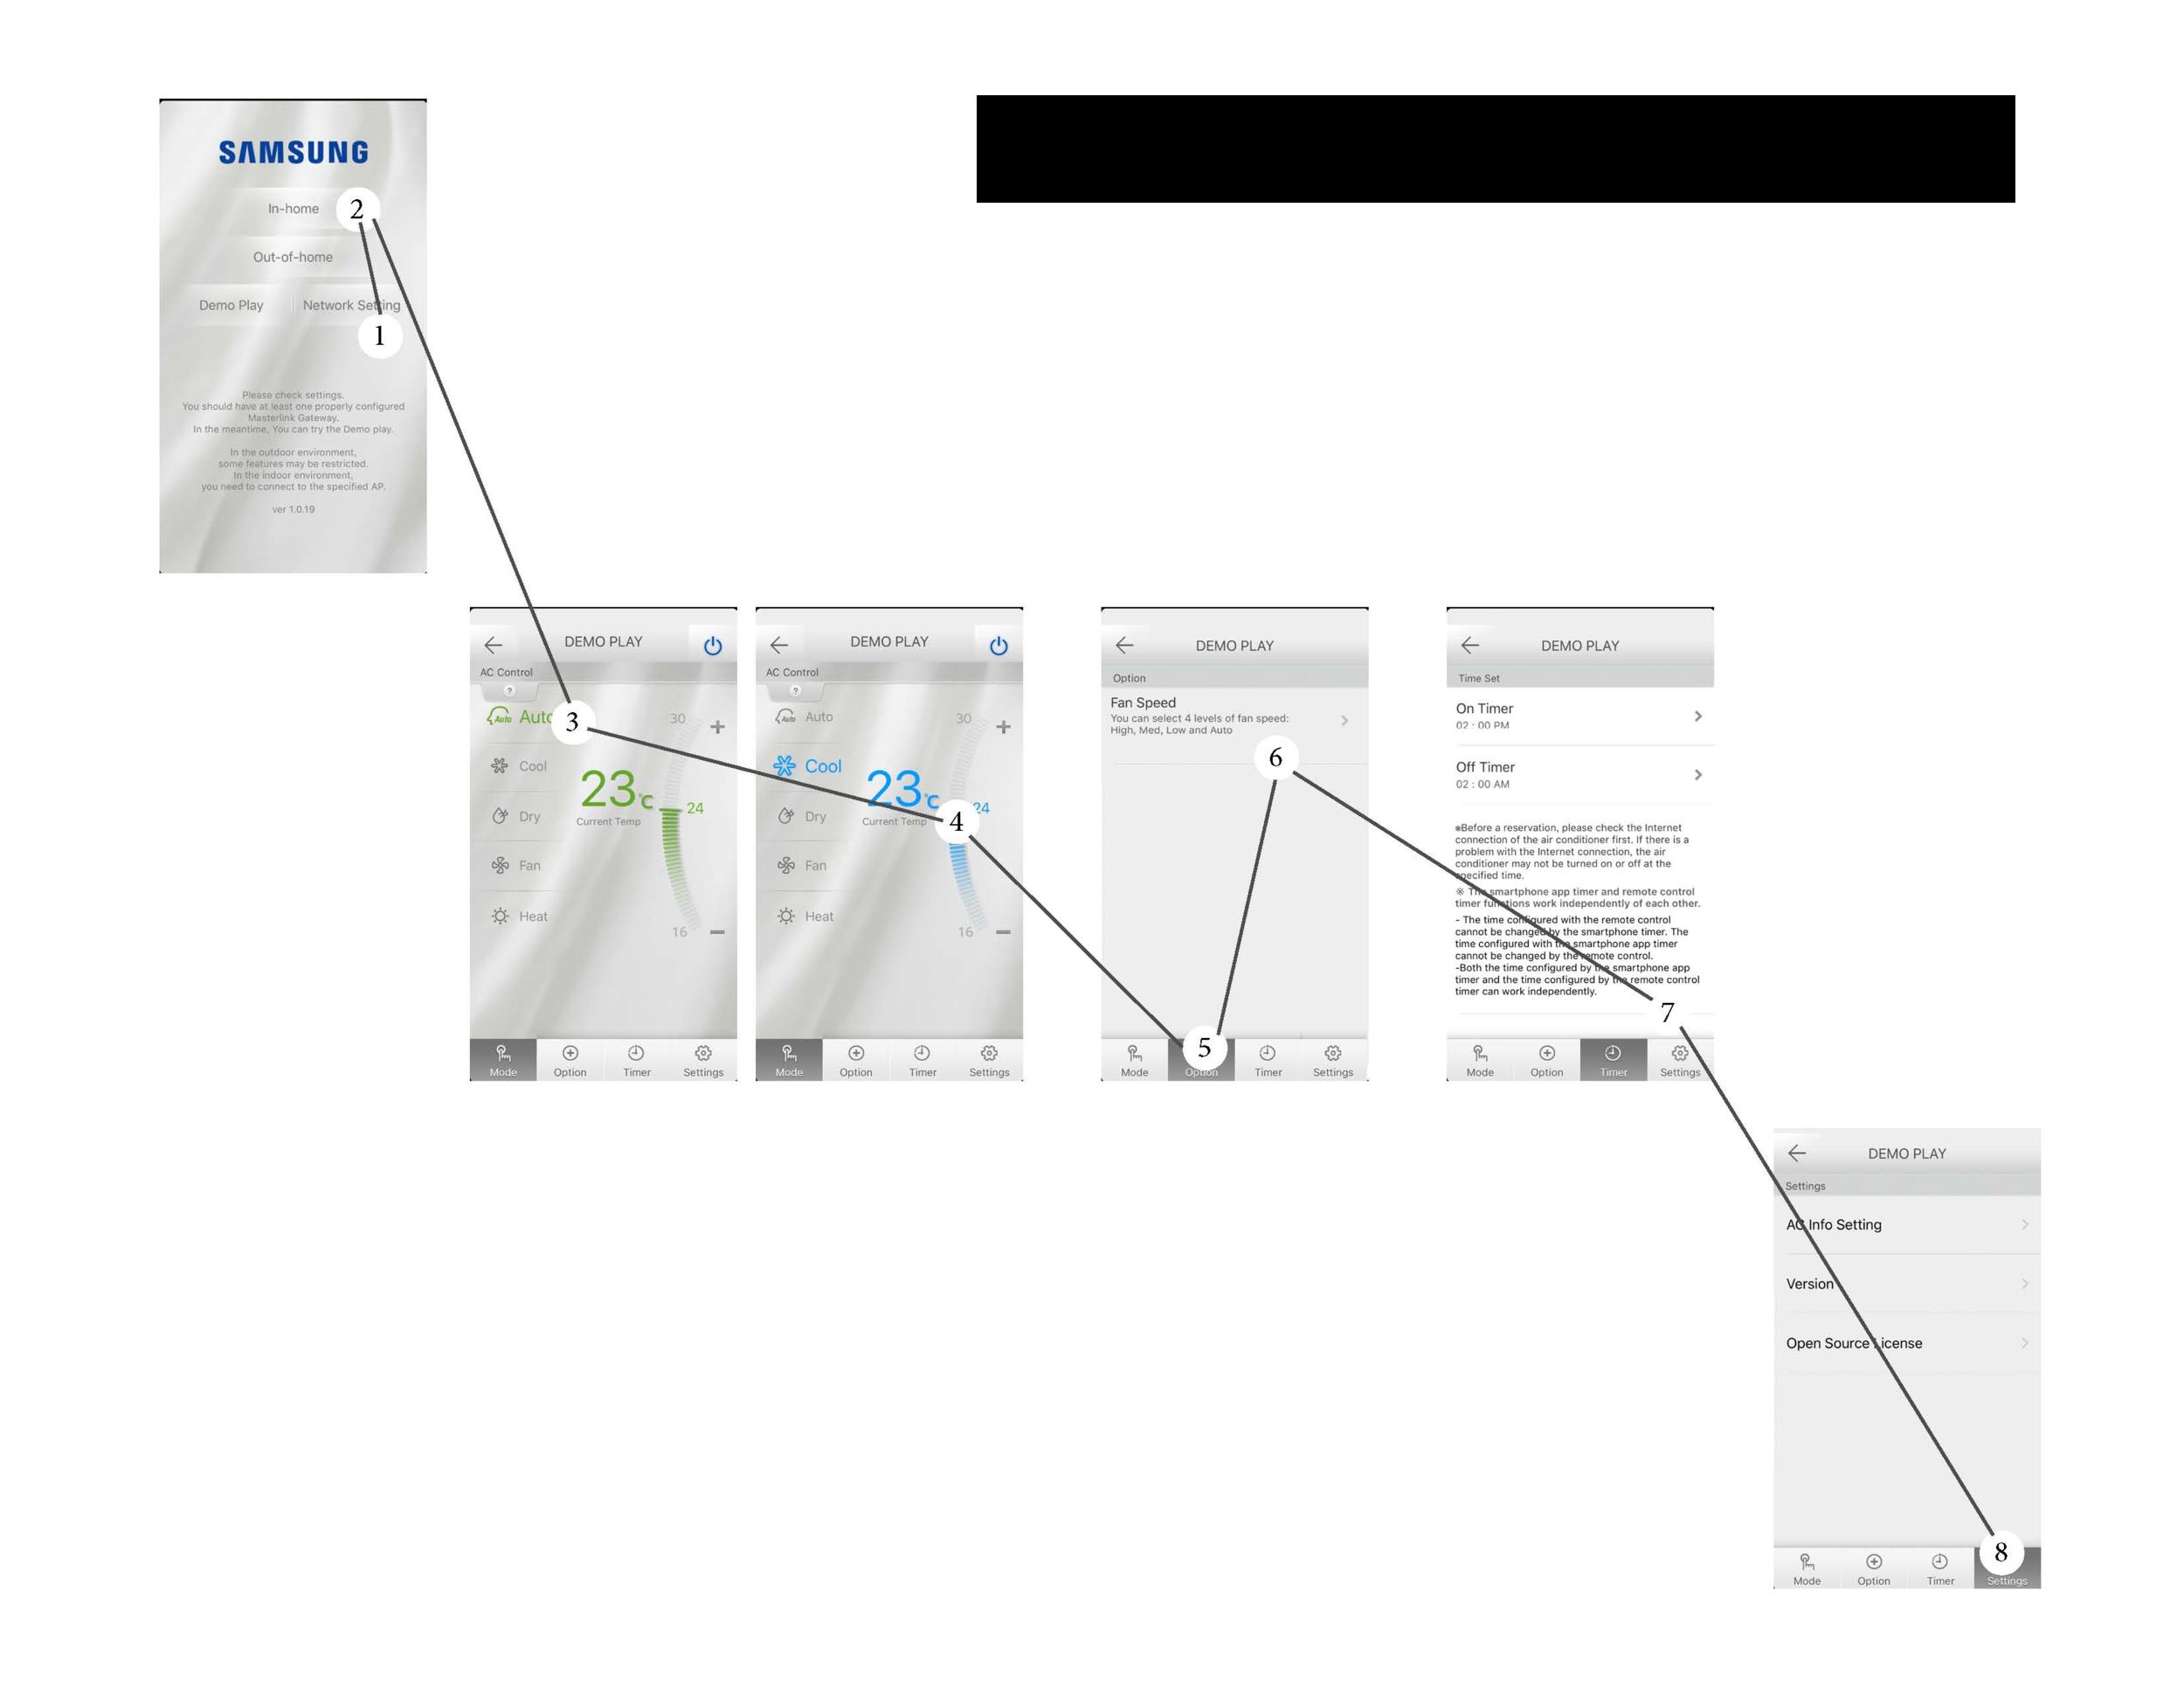 Zhao_Qiuji_interfacez_analysis_10app_Page_2.png